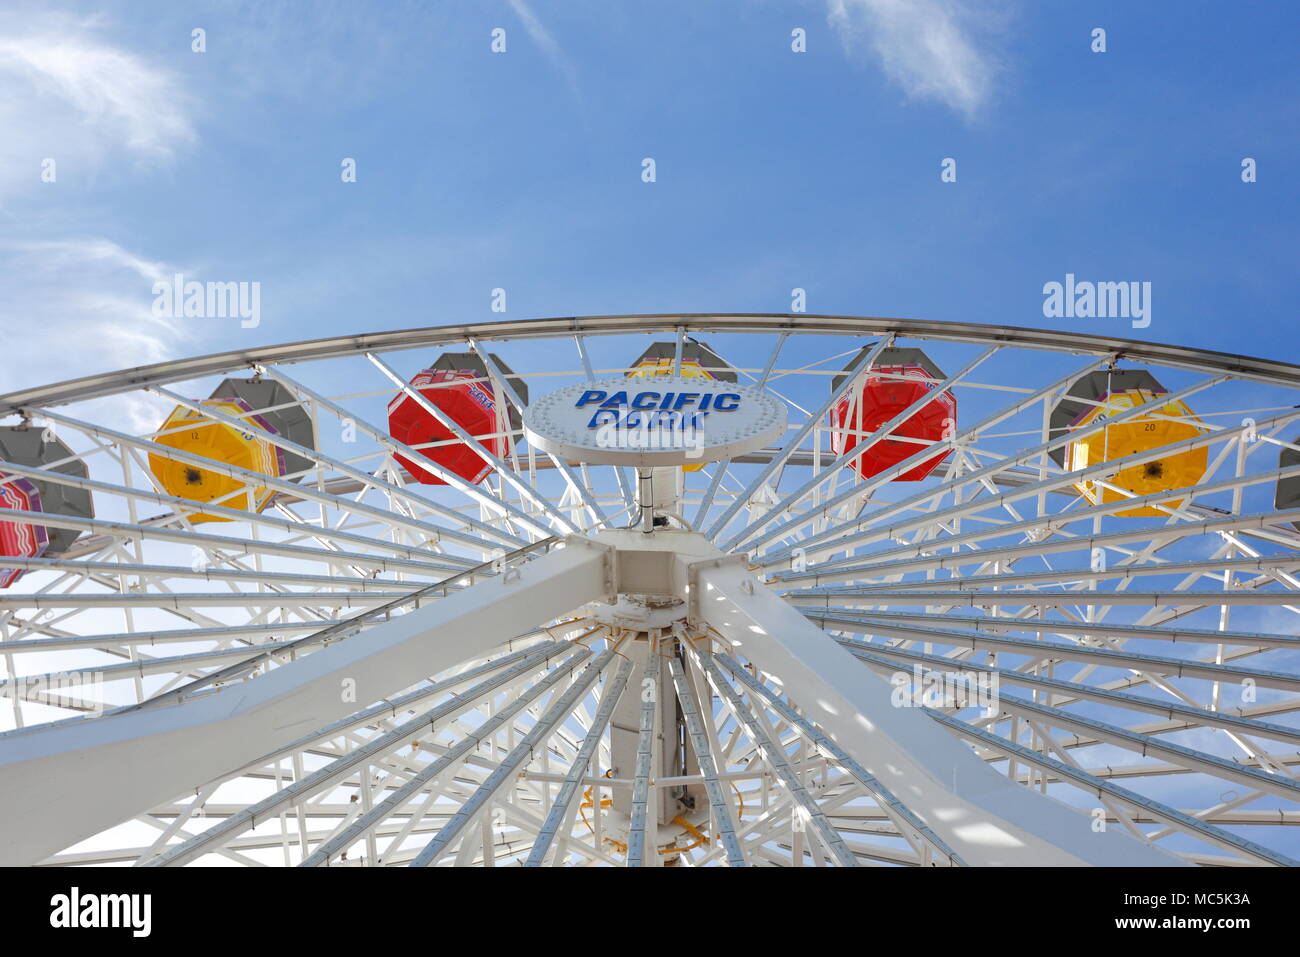 Ferris Wheel (Big Wheel) at Pacific Park, Santa Monica, California showing small segment of the wheel and gondolas (no people) against a blue sky - Stock Image